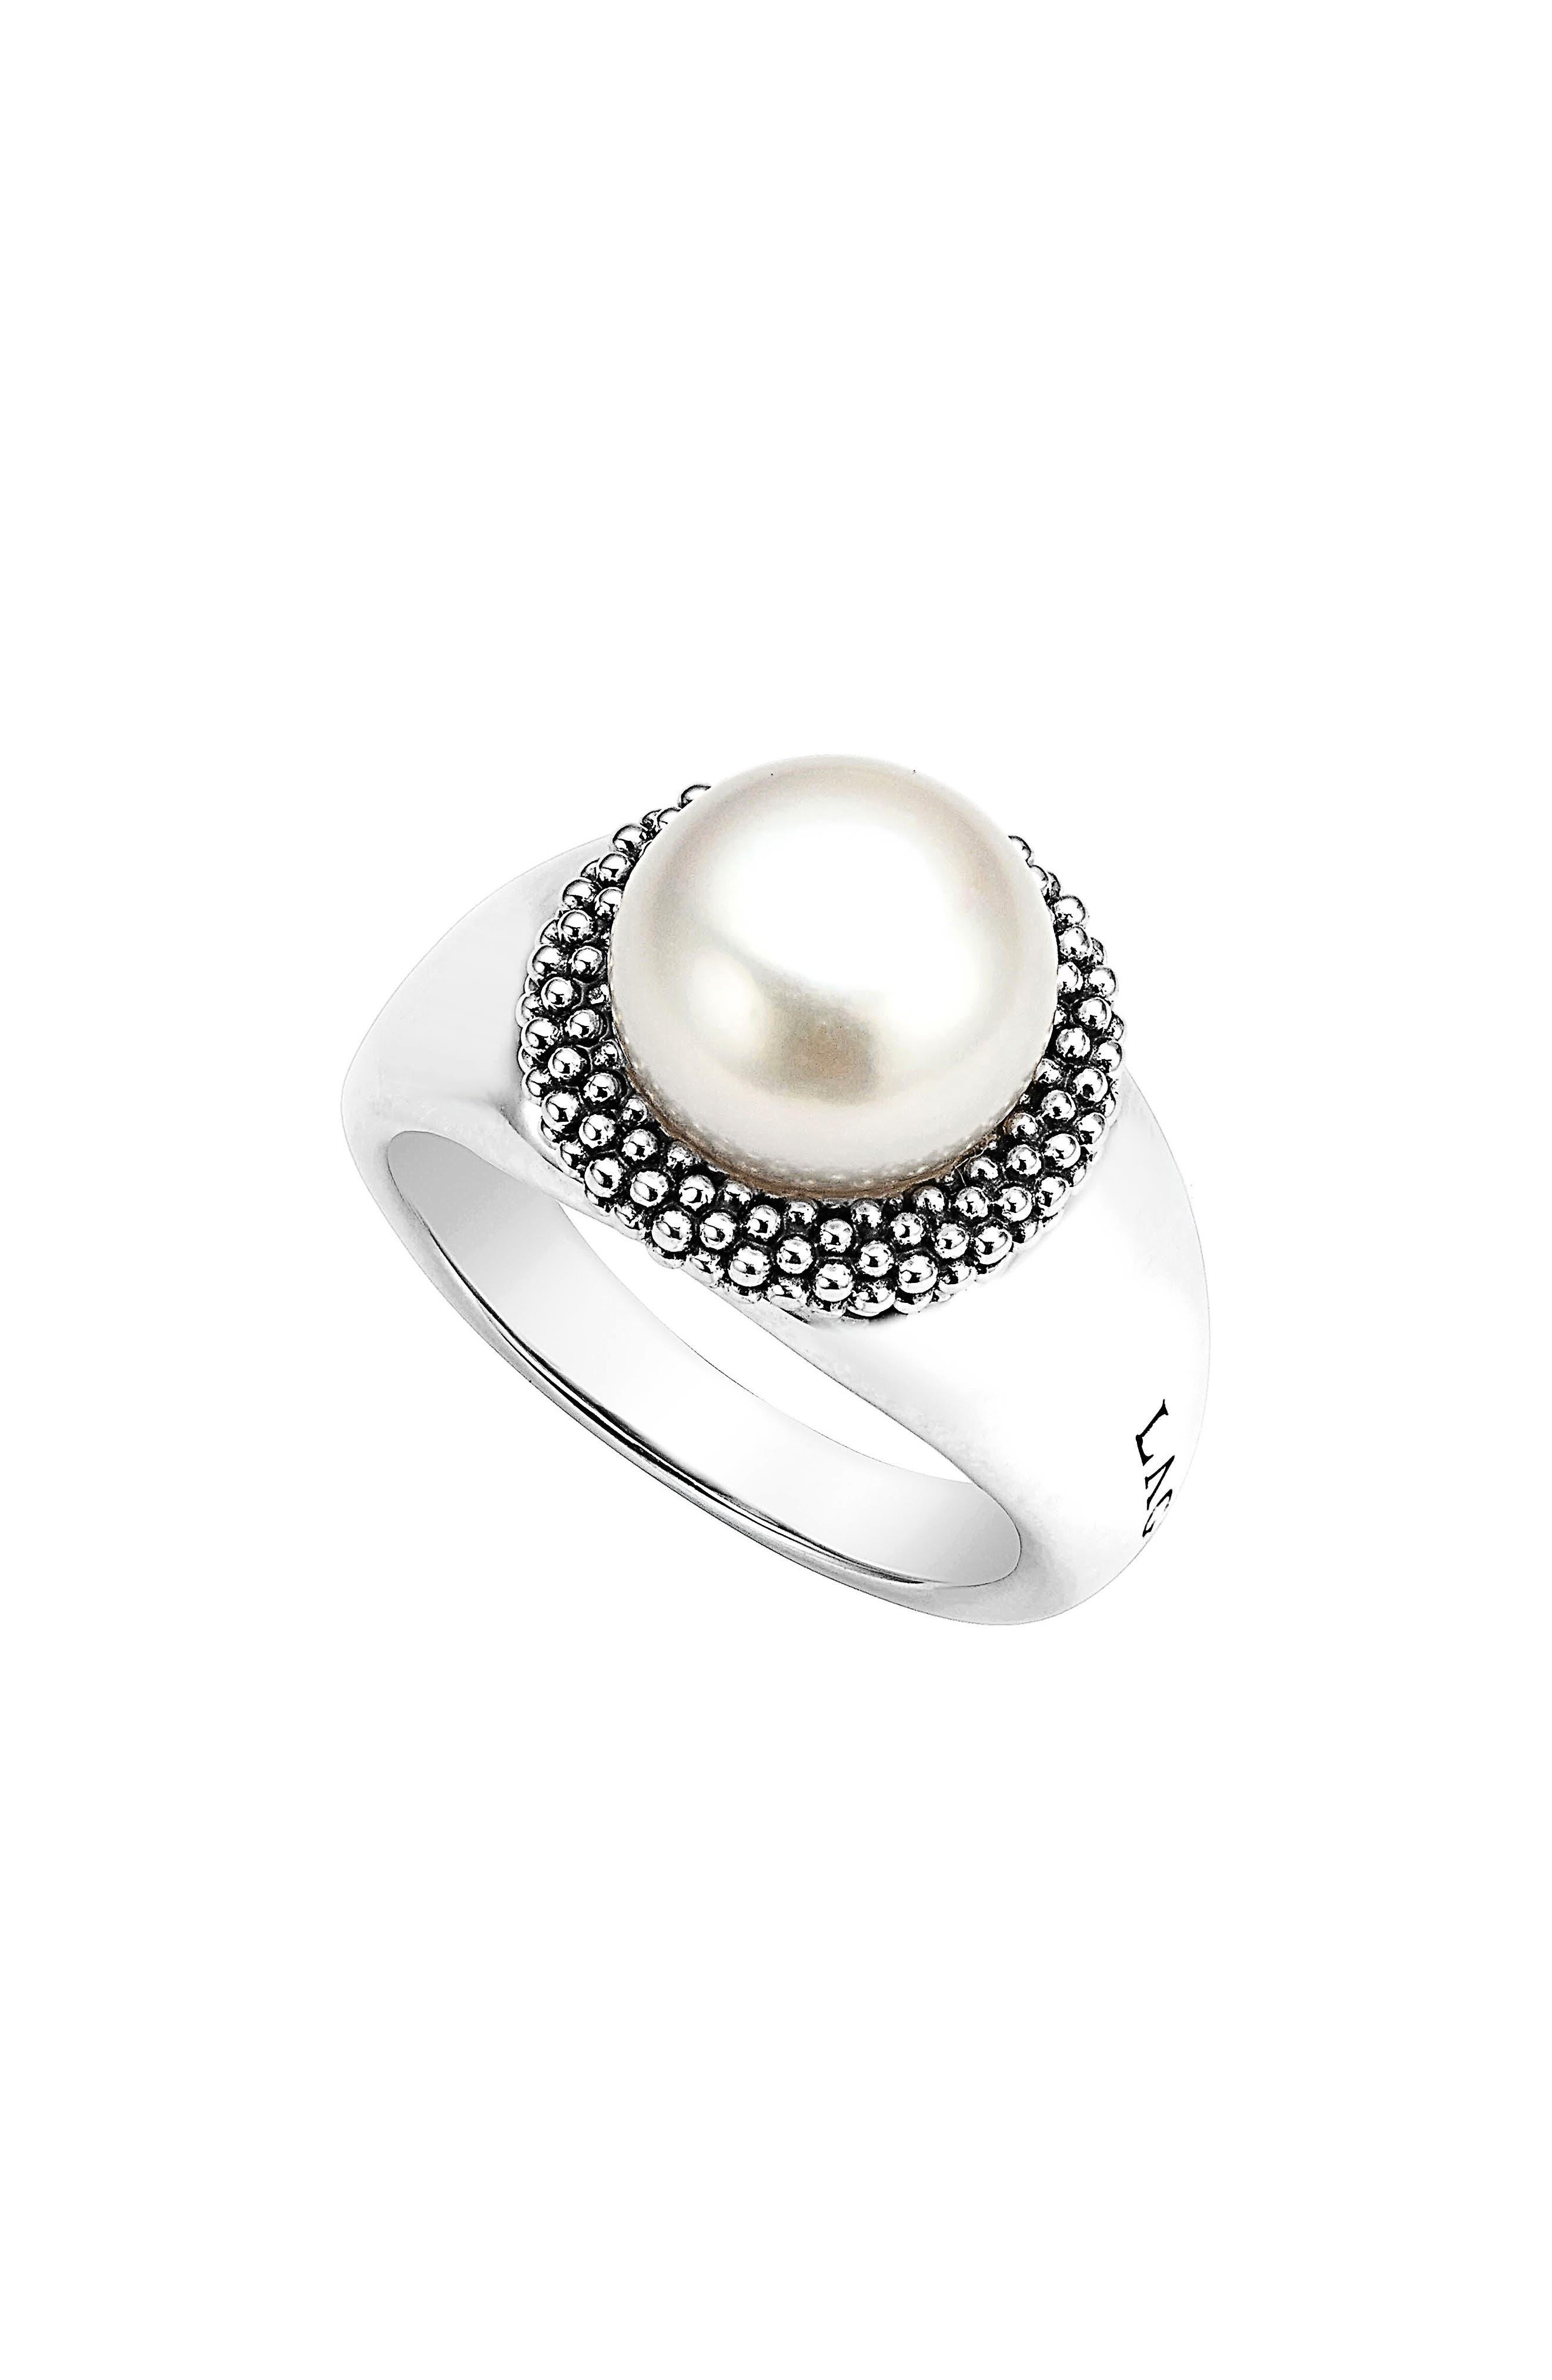 'Luna' Large Pearl Ring,                             Main thumbnail 1, color,                             040